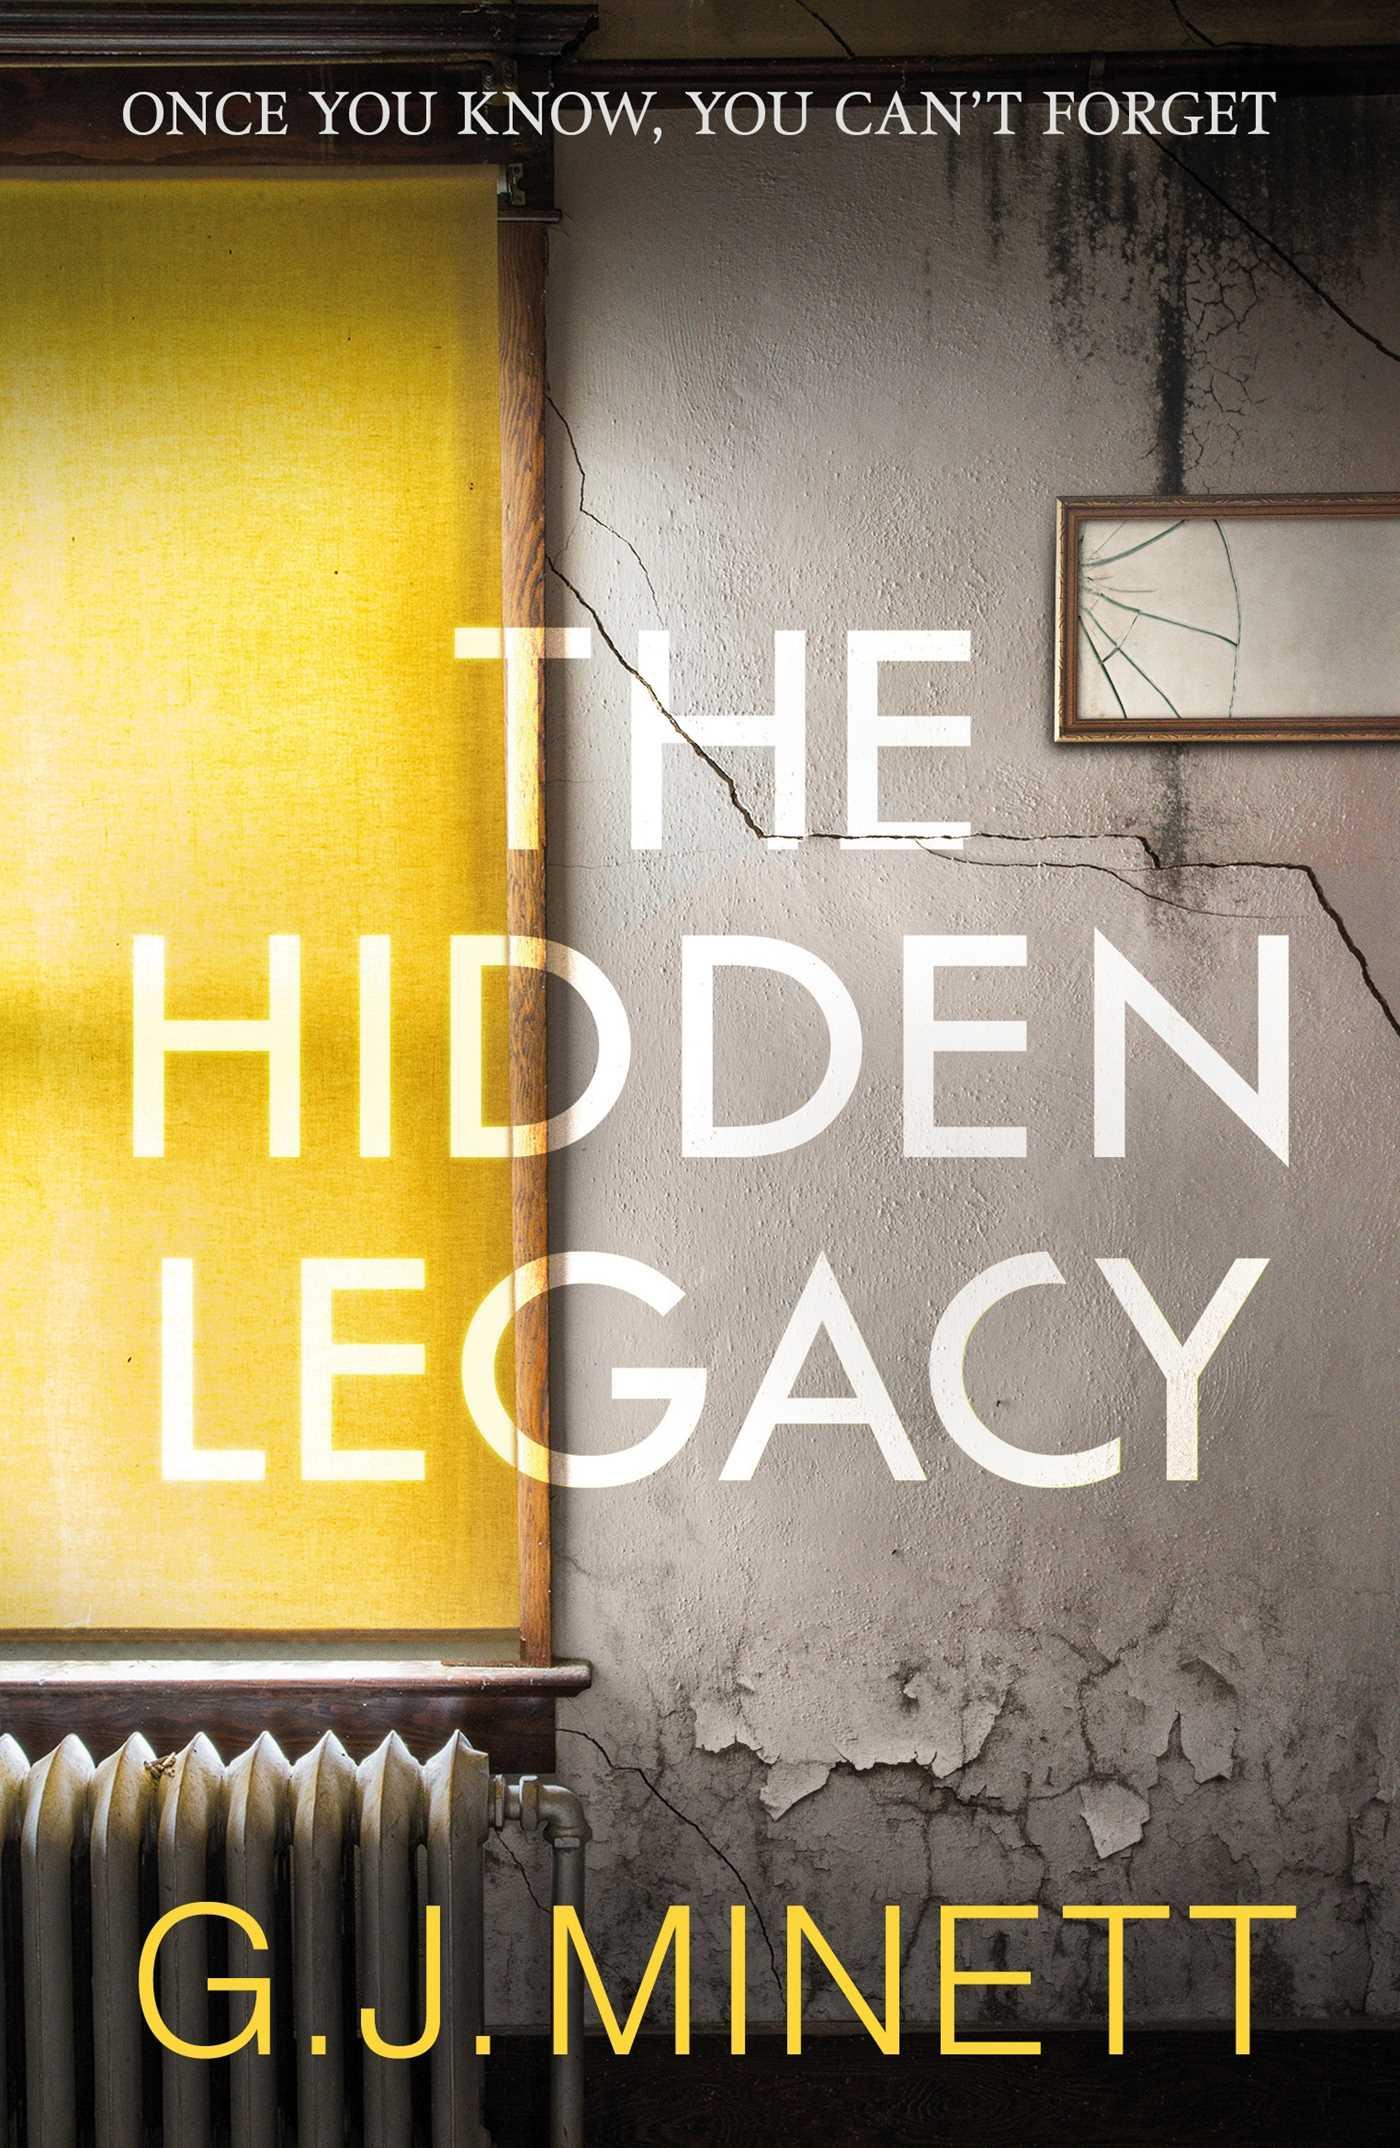 The hidden legacy 9781499861679 hr